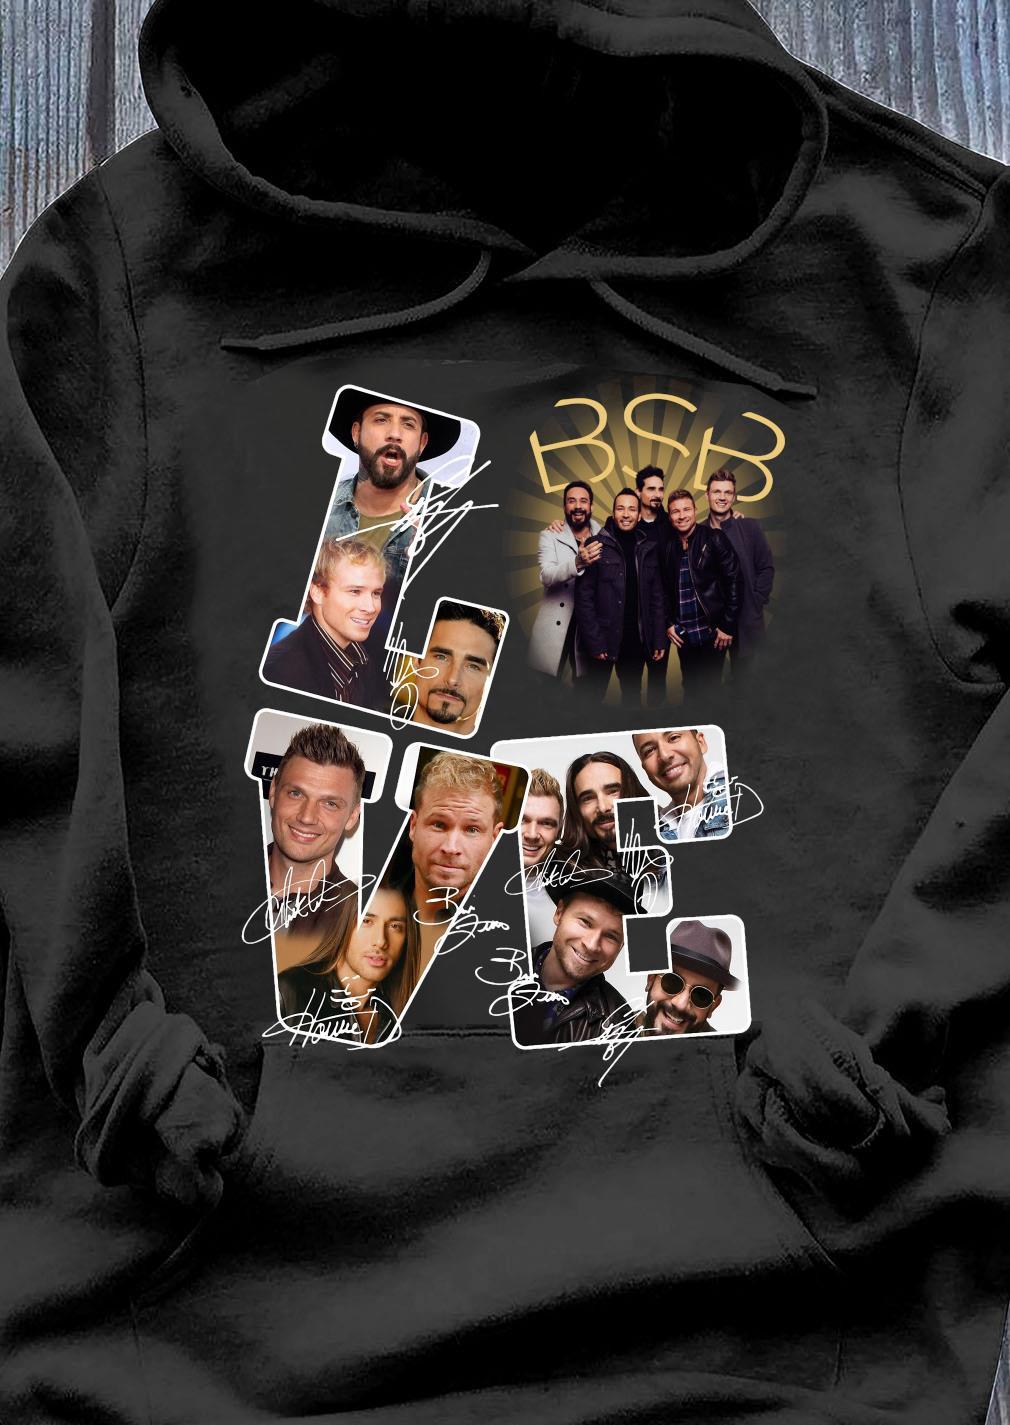 Love BSB Backstreet Boys Signatures Shirt Hoodie